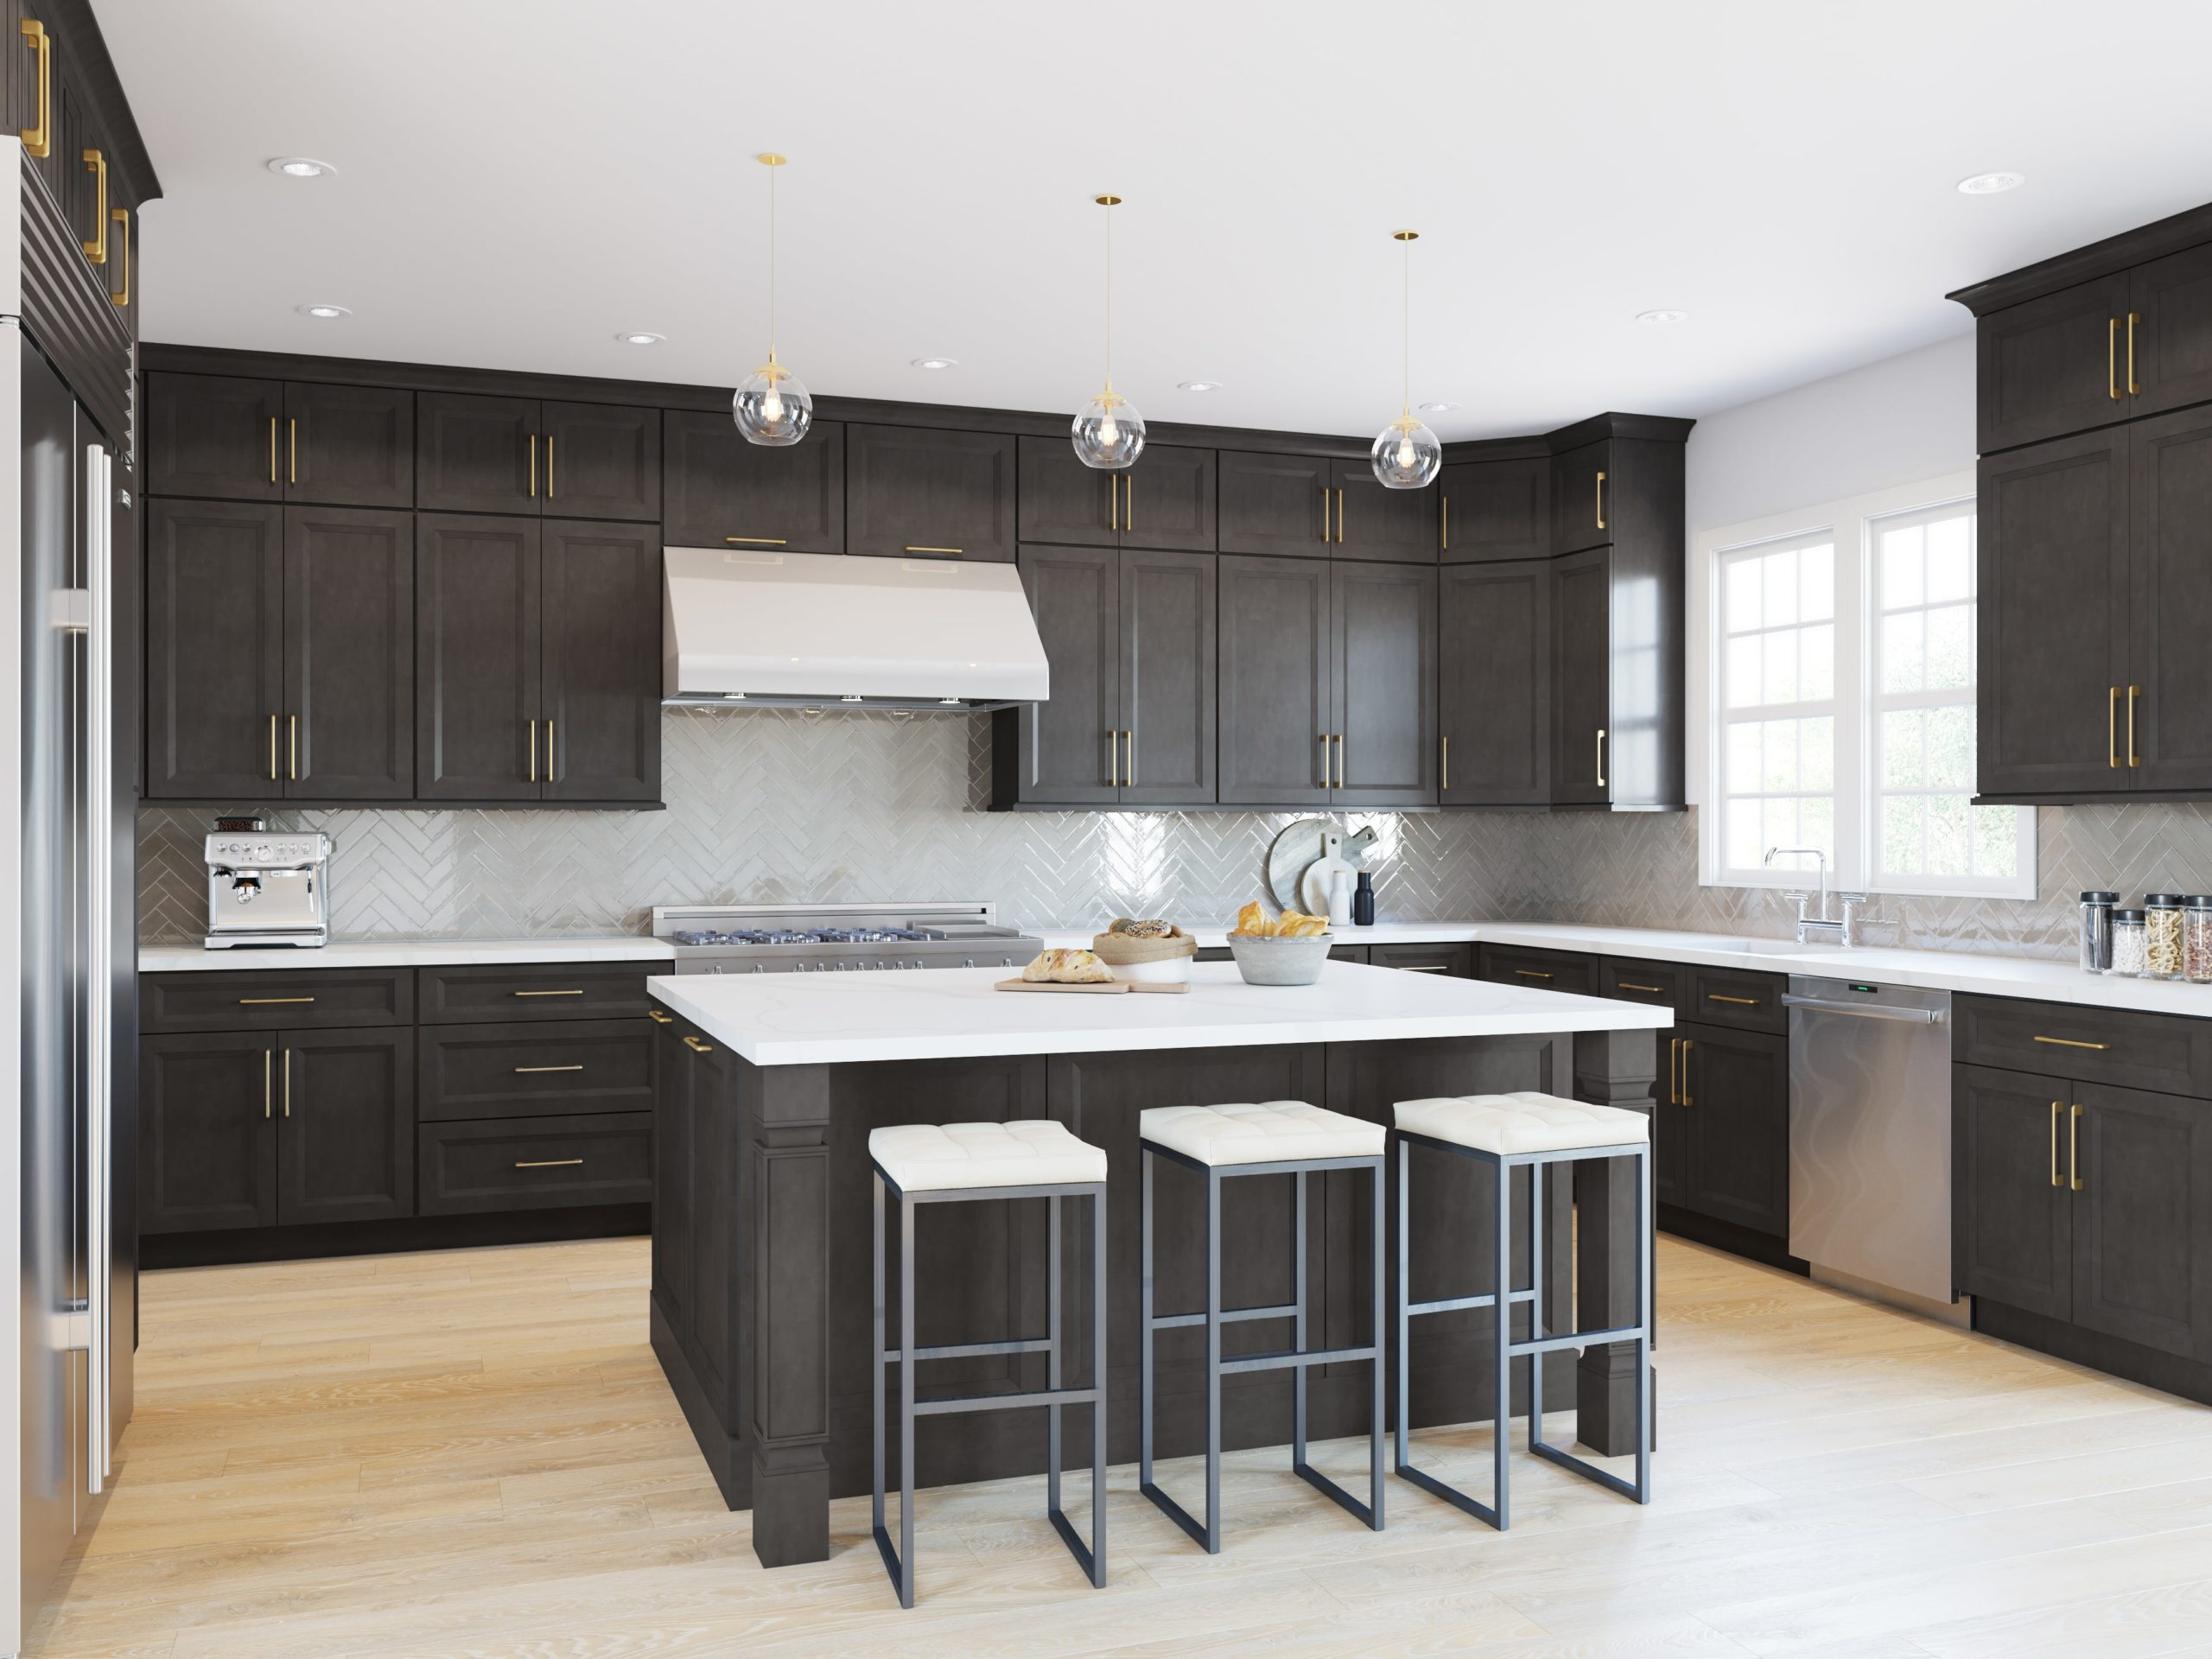 New kitchen featuring Fabuwood Onyx Cobblestone shaker gray kitchen cabinets